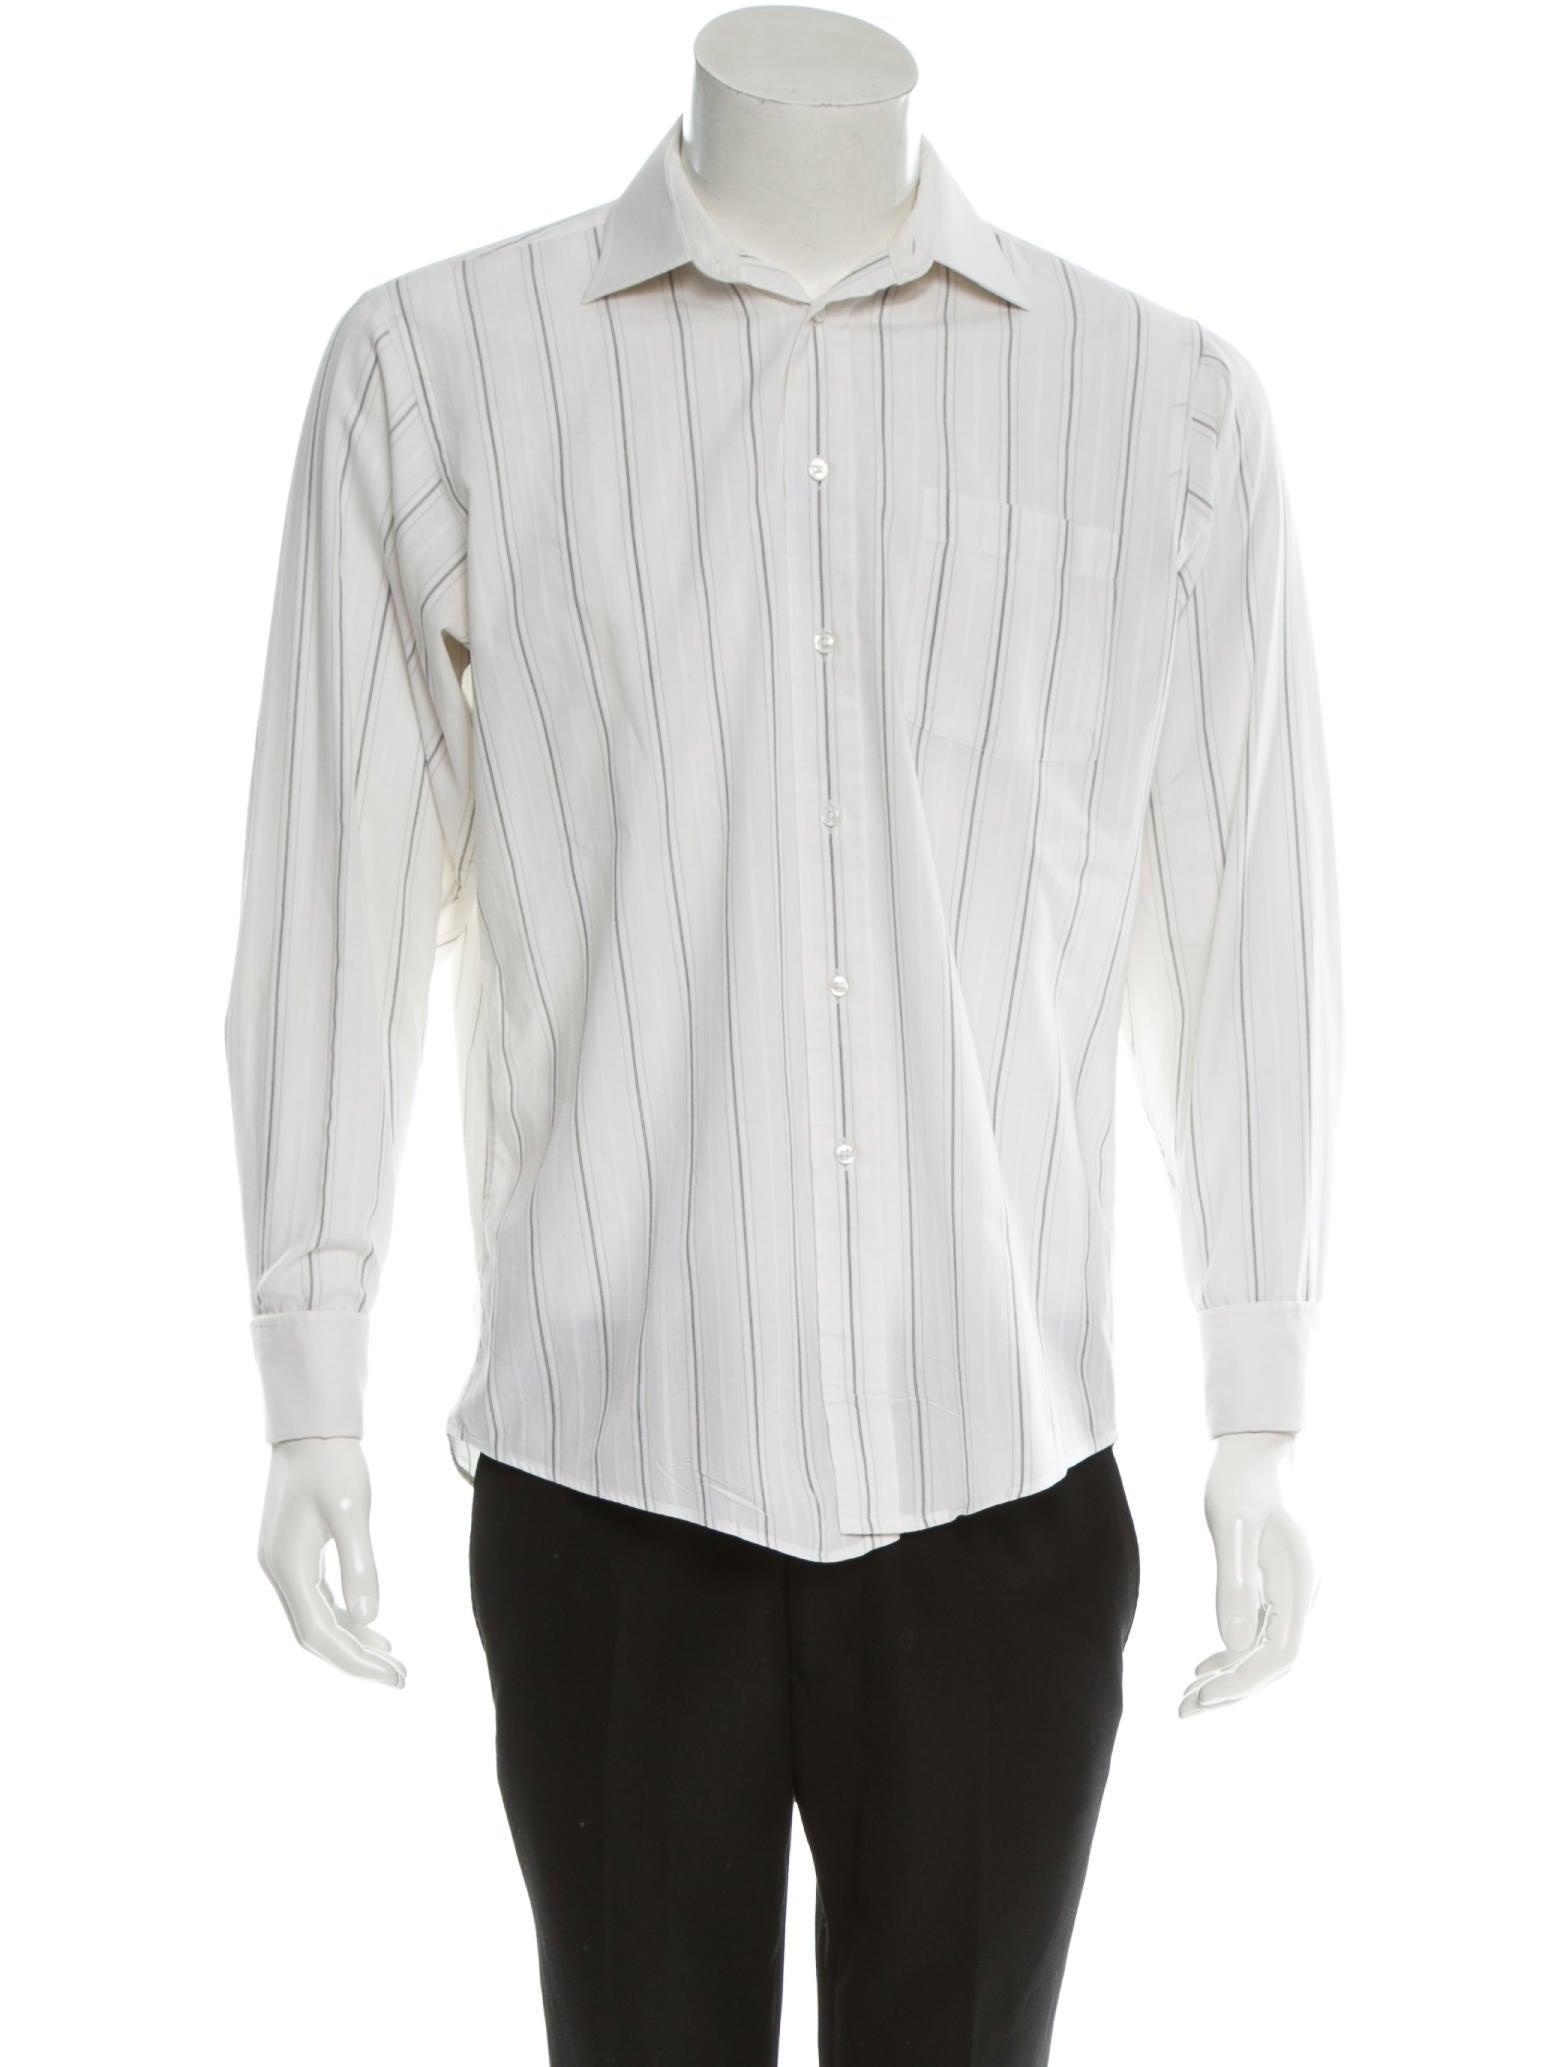 Christian dior shirt mens shirts chr32800 the realreal for Christian dior button up shirt